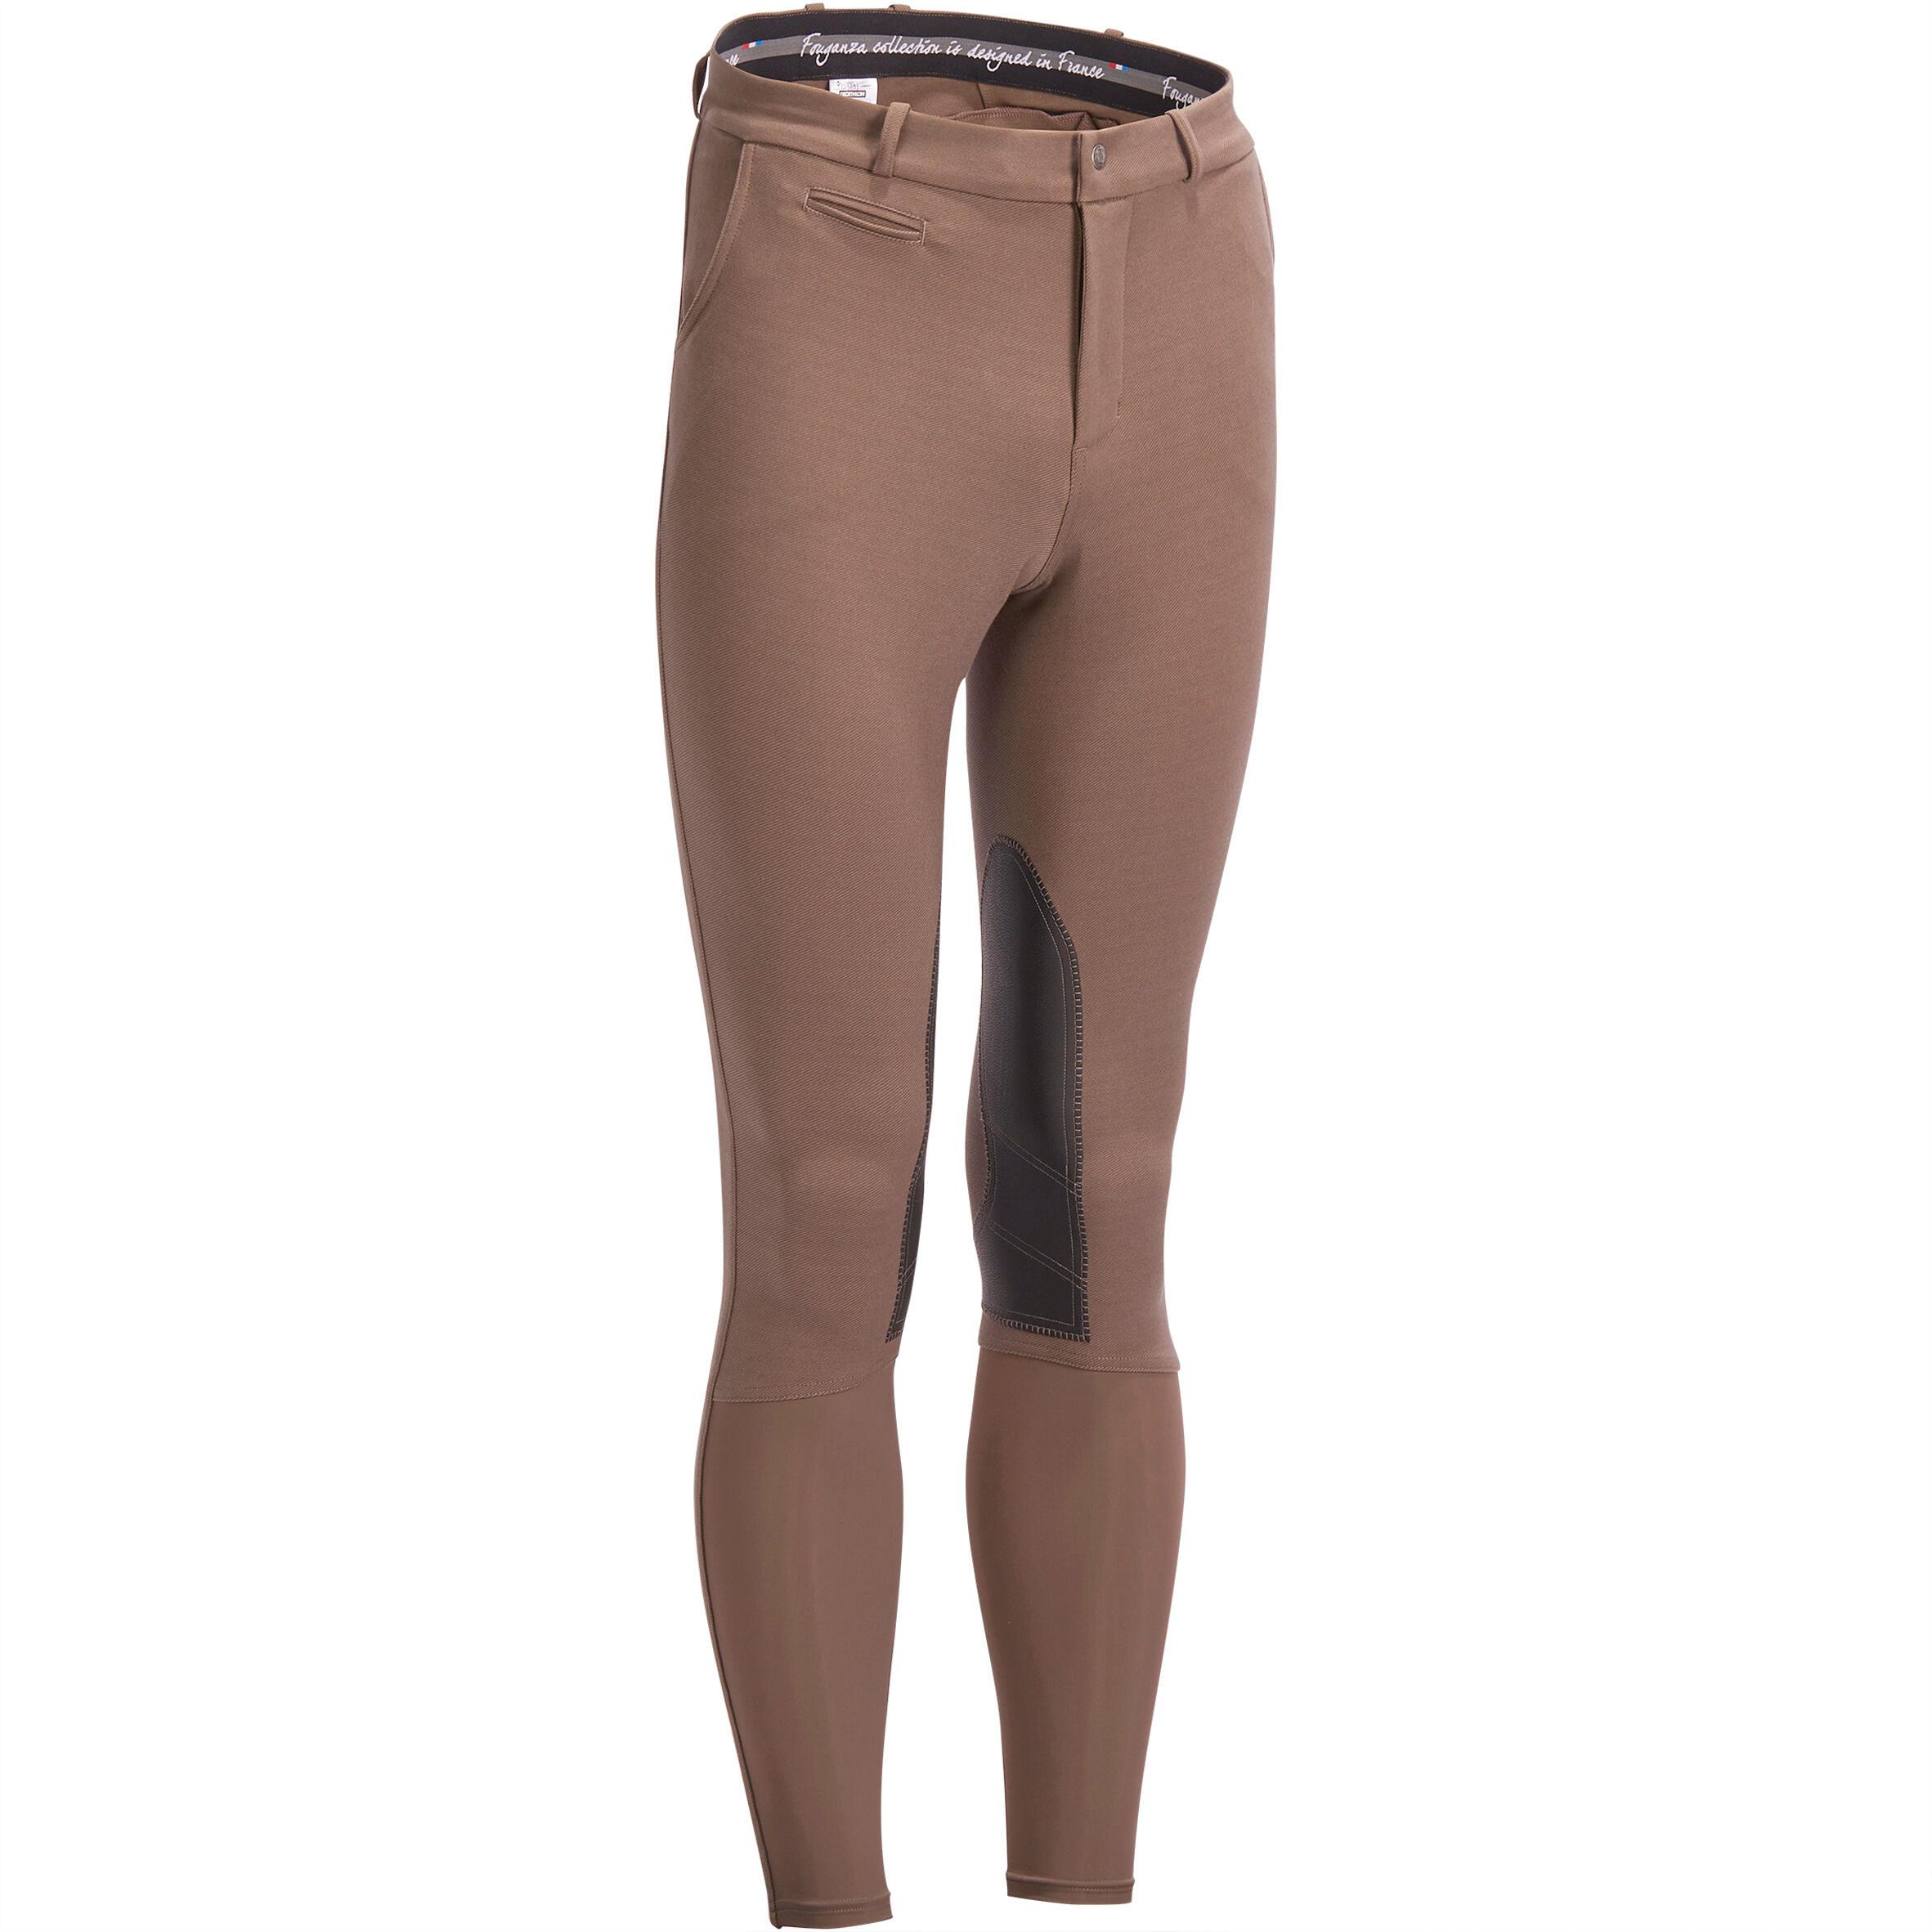 Pantalon 140 bazon maro Copii